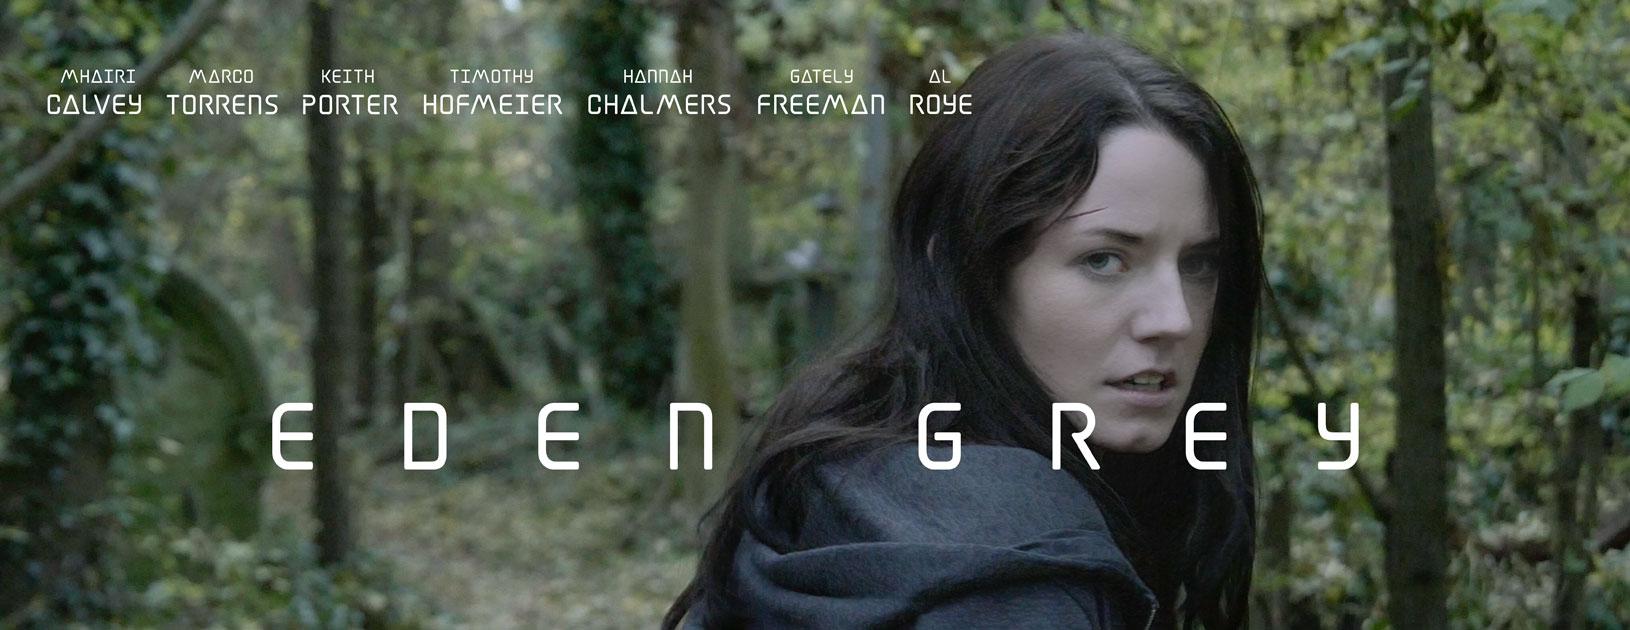 Eden Grey homepage